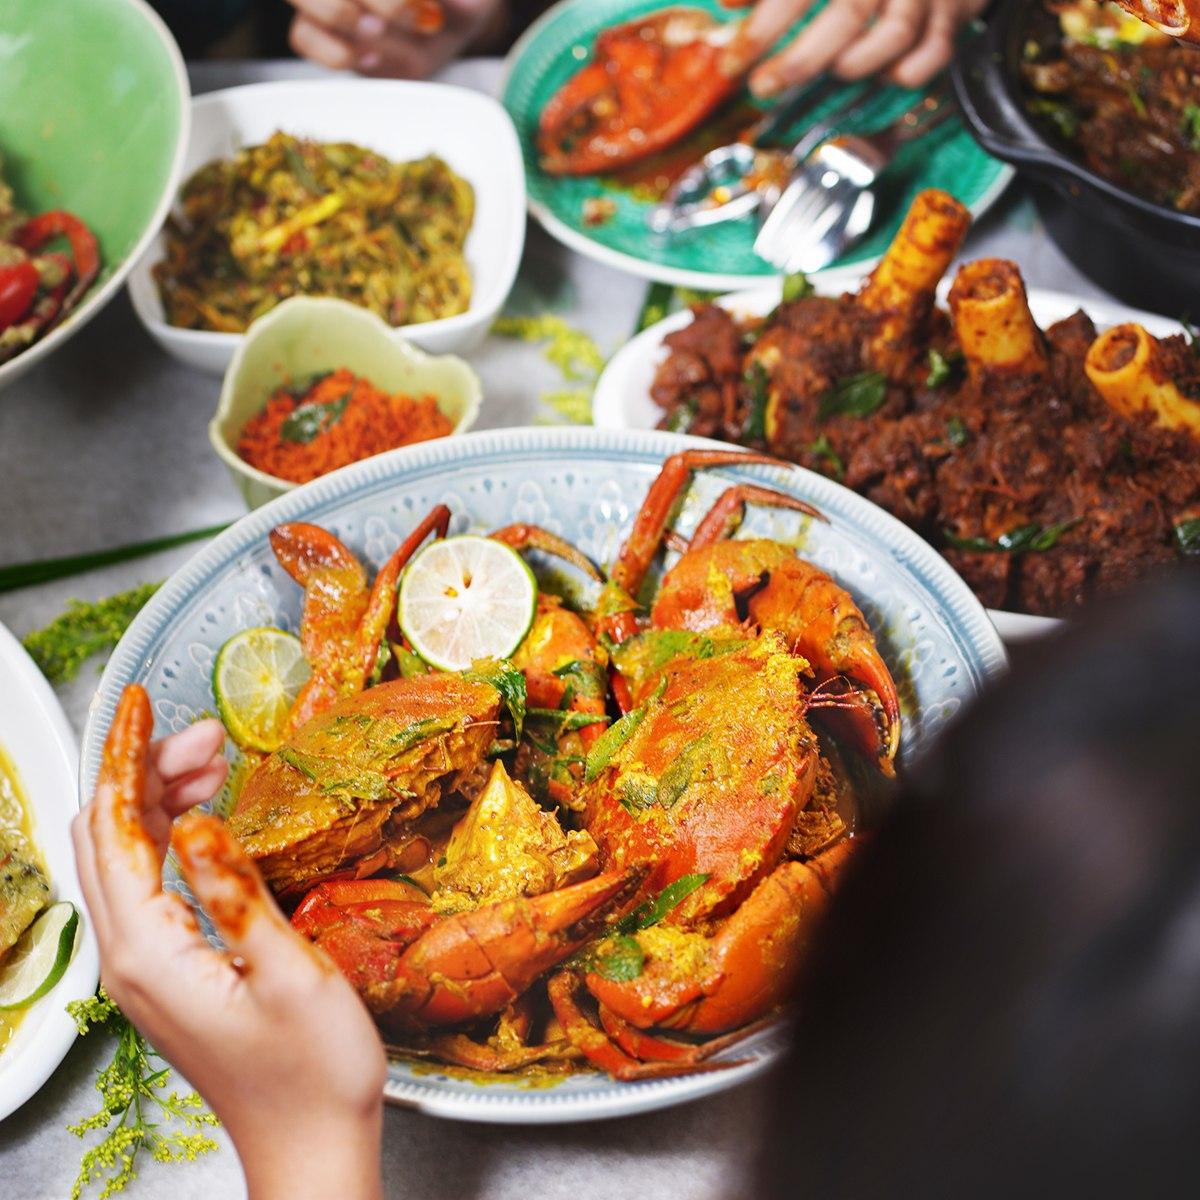 The Lankan Crabs